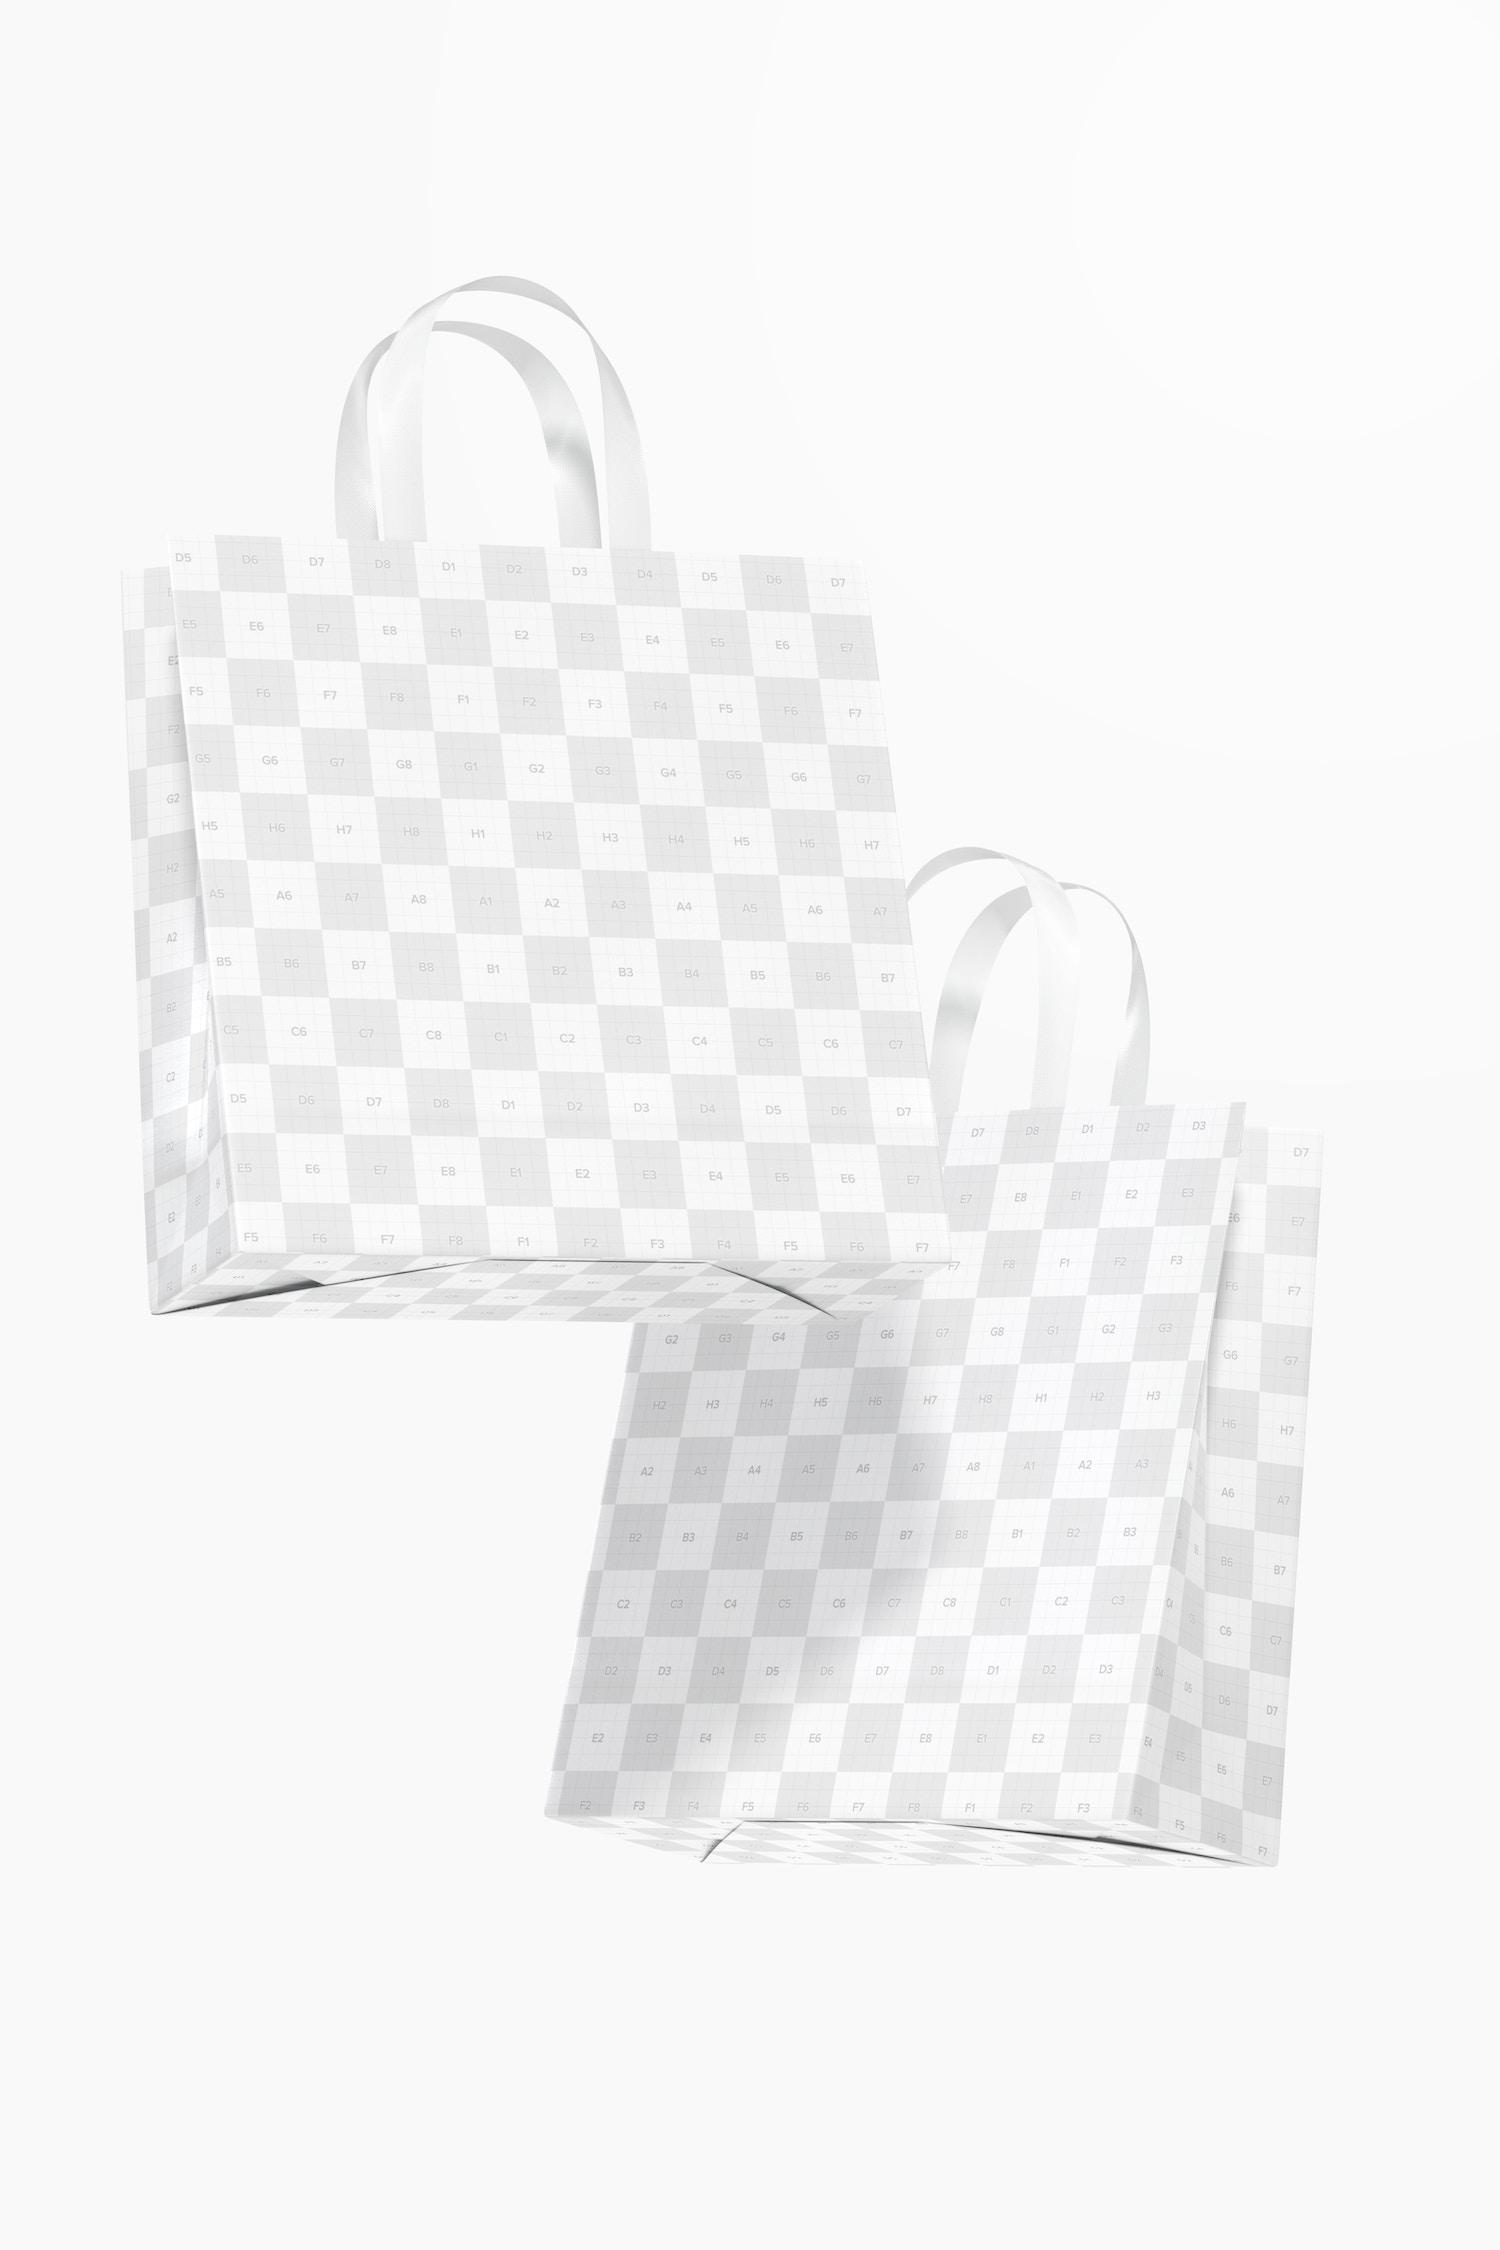 Medium Gift Bags with Ribbon Handle Mockup, Floating